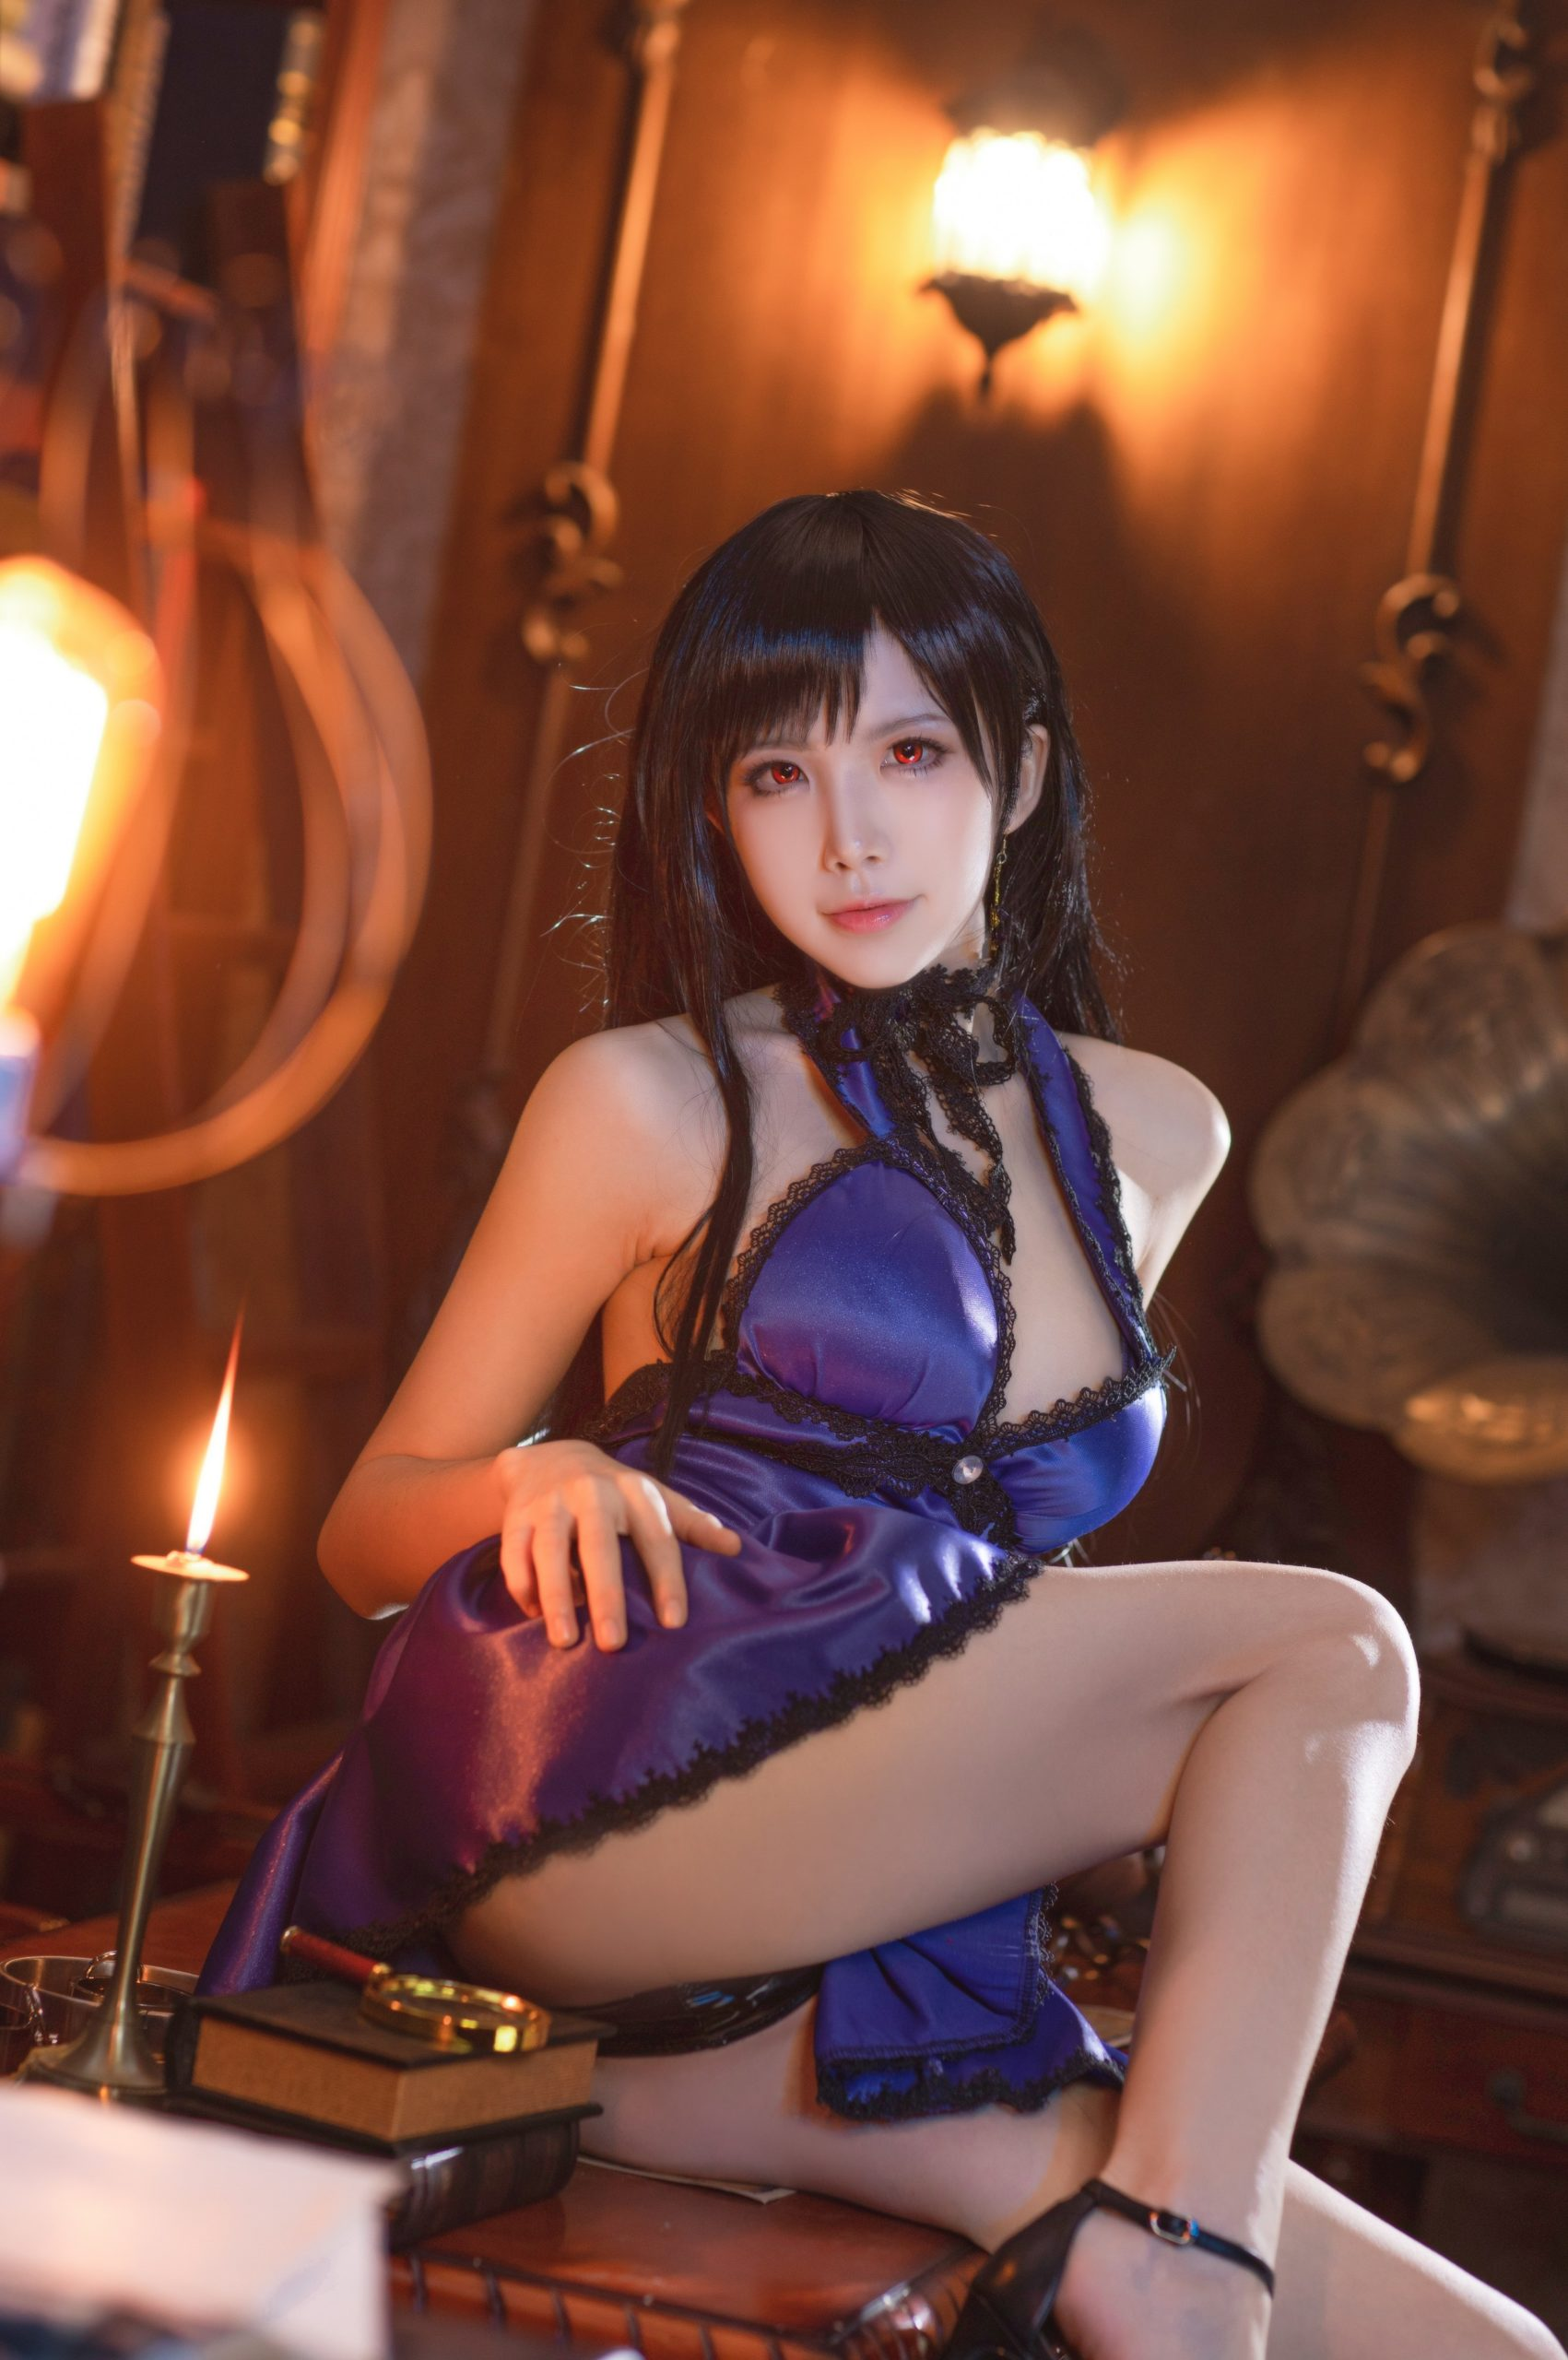 Final Fantasy VII Tifa Lockhart Night Dress Cosplay by Aqua Quite Inviting 33